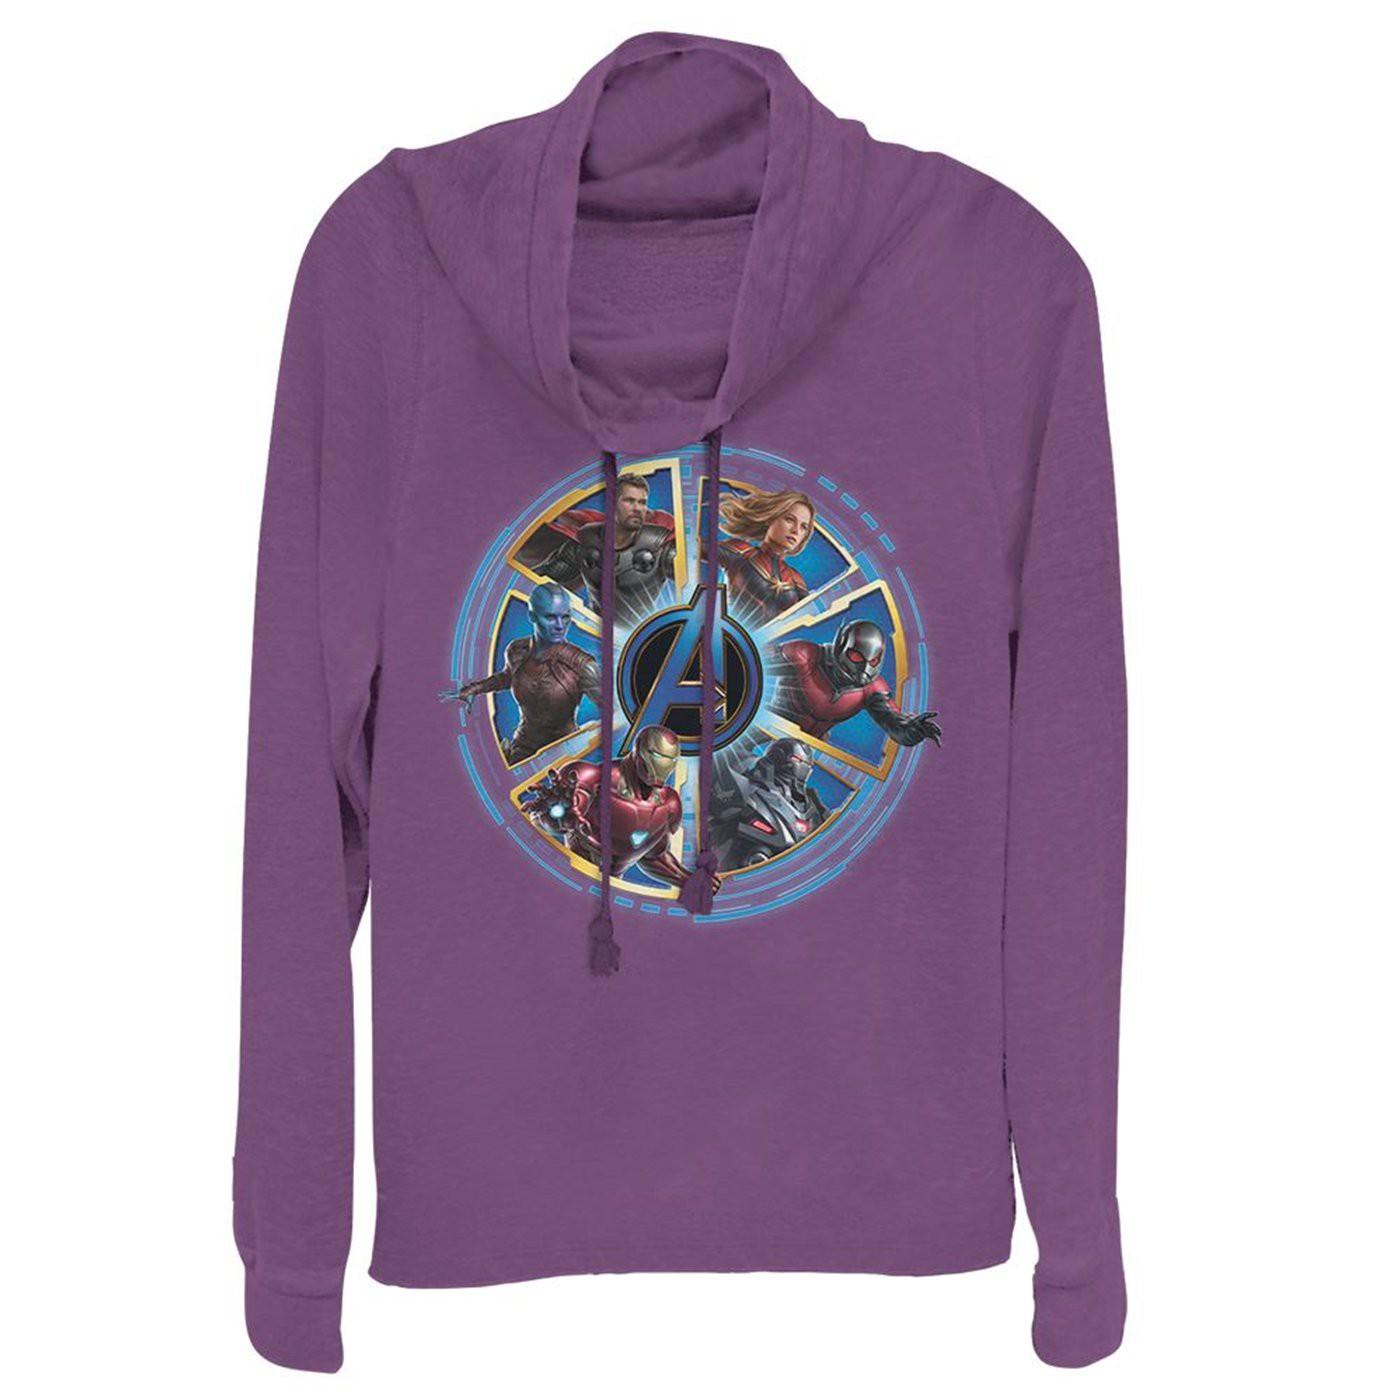 Avengers Endgame Heroes Circle Women's Cowl Neck Sweater